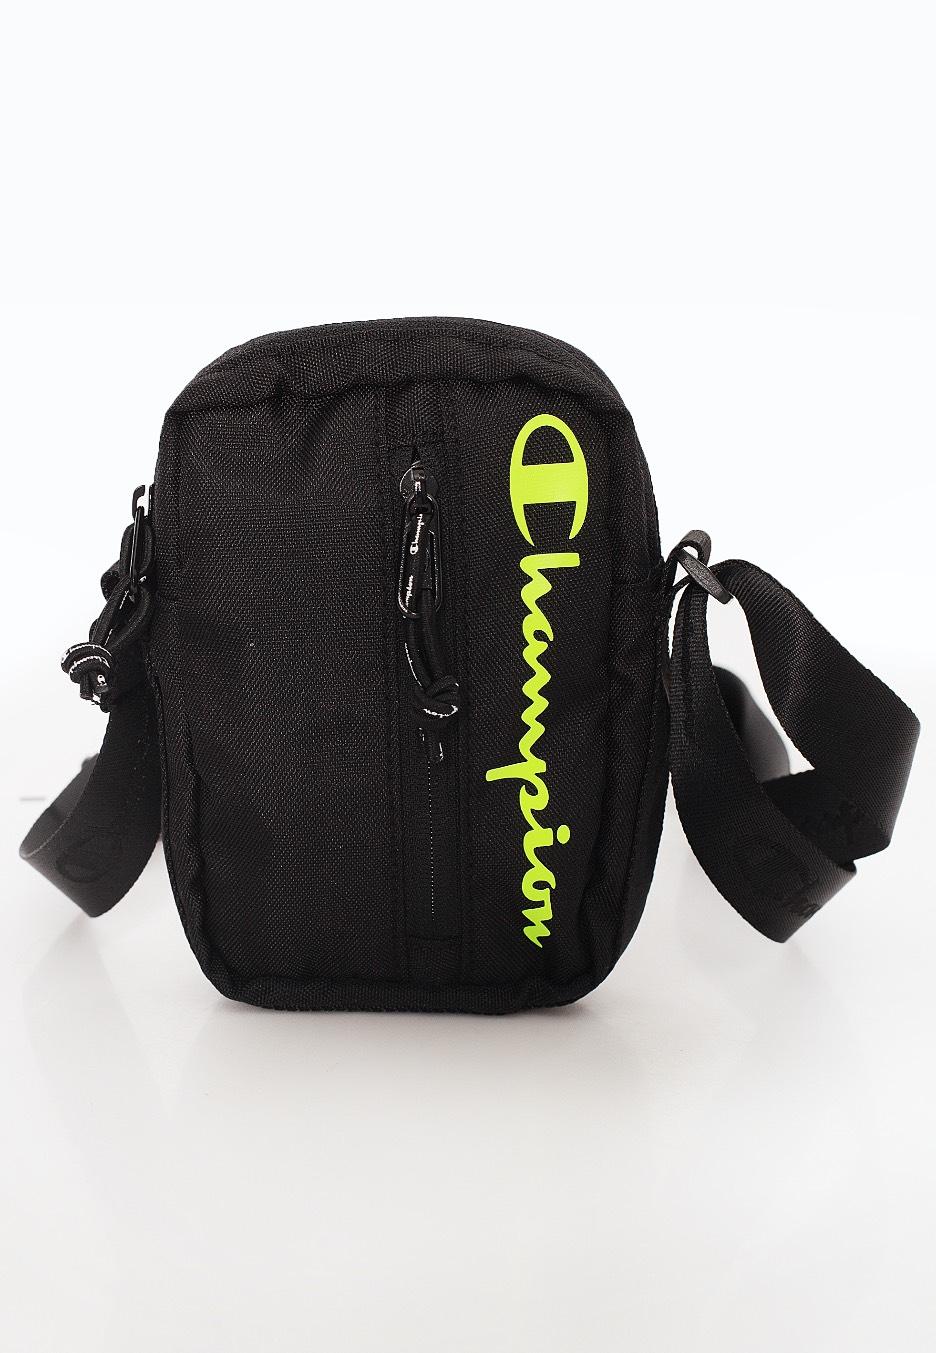 Champion Small Shoulder Bag Black